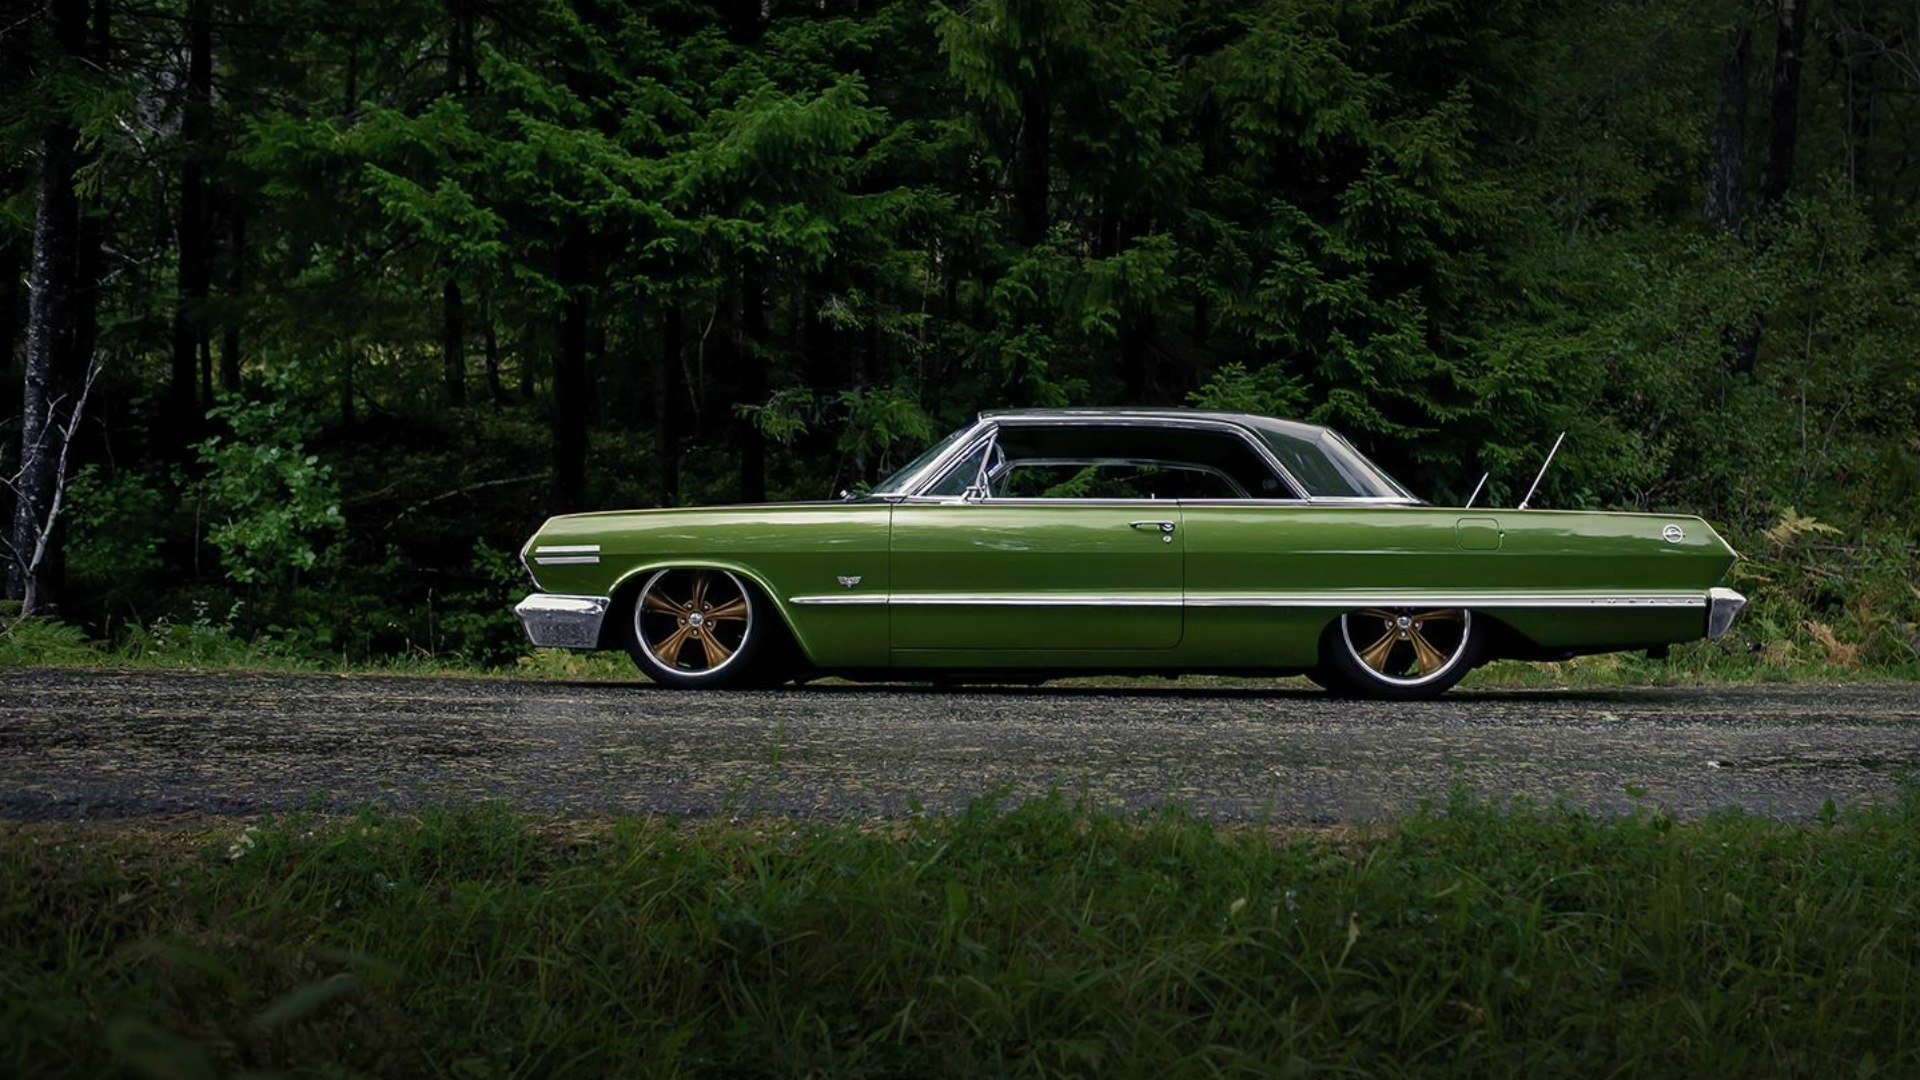 Chevrolet impala lowrider wallpaper 1920x1080 421237 wallpaperup